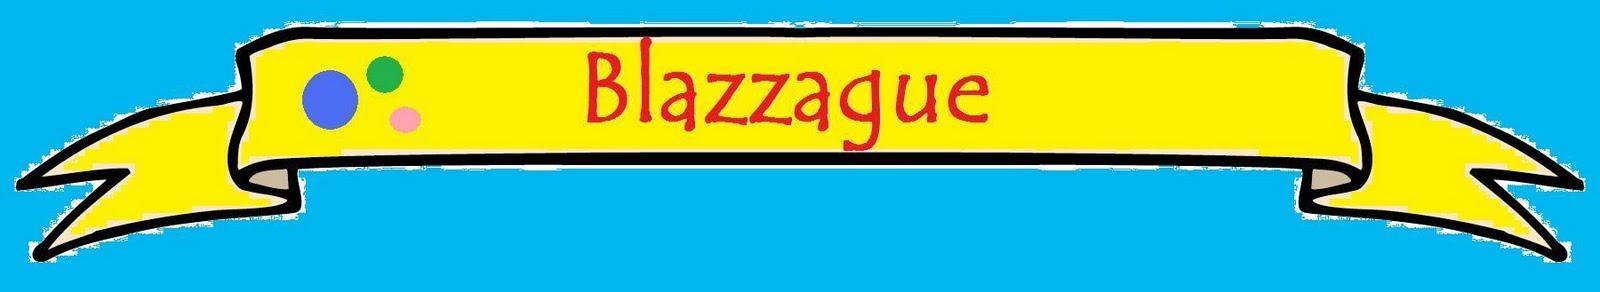 Blazzague